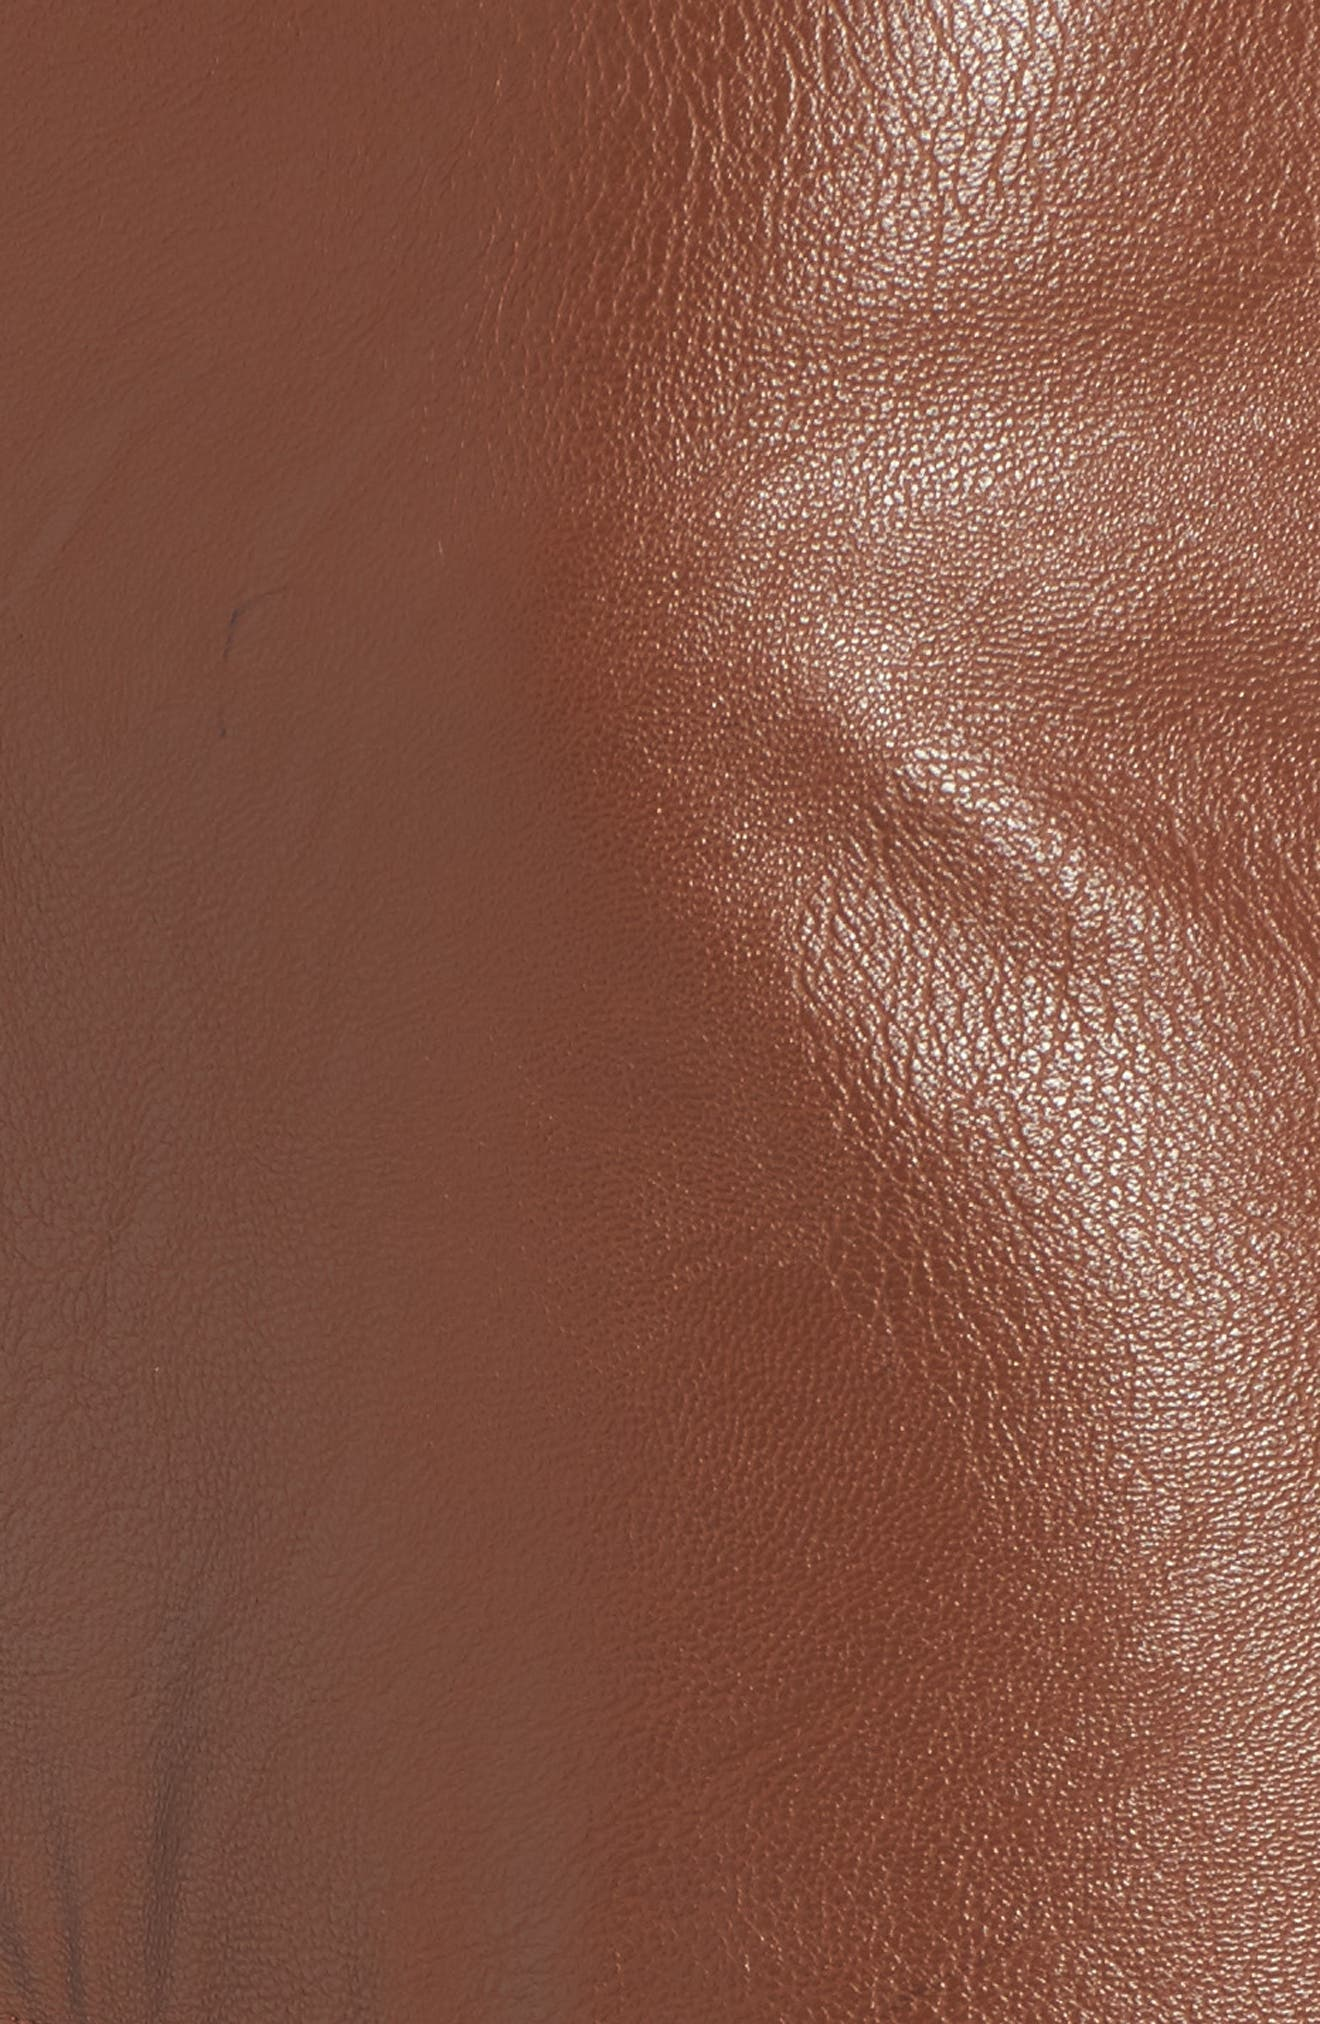 Ruffle Hem Faux Leather Skirt,                             Alternate thumbnail 5, color,